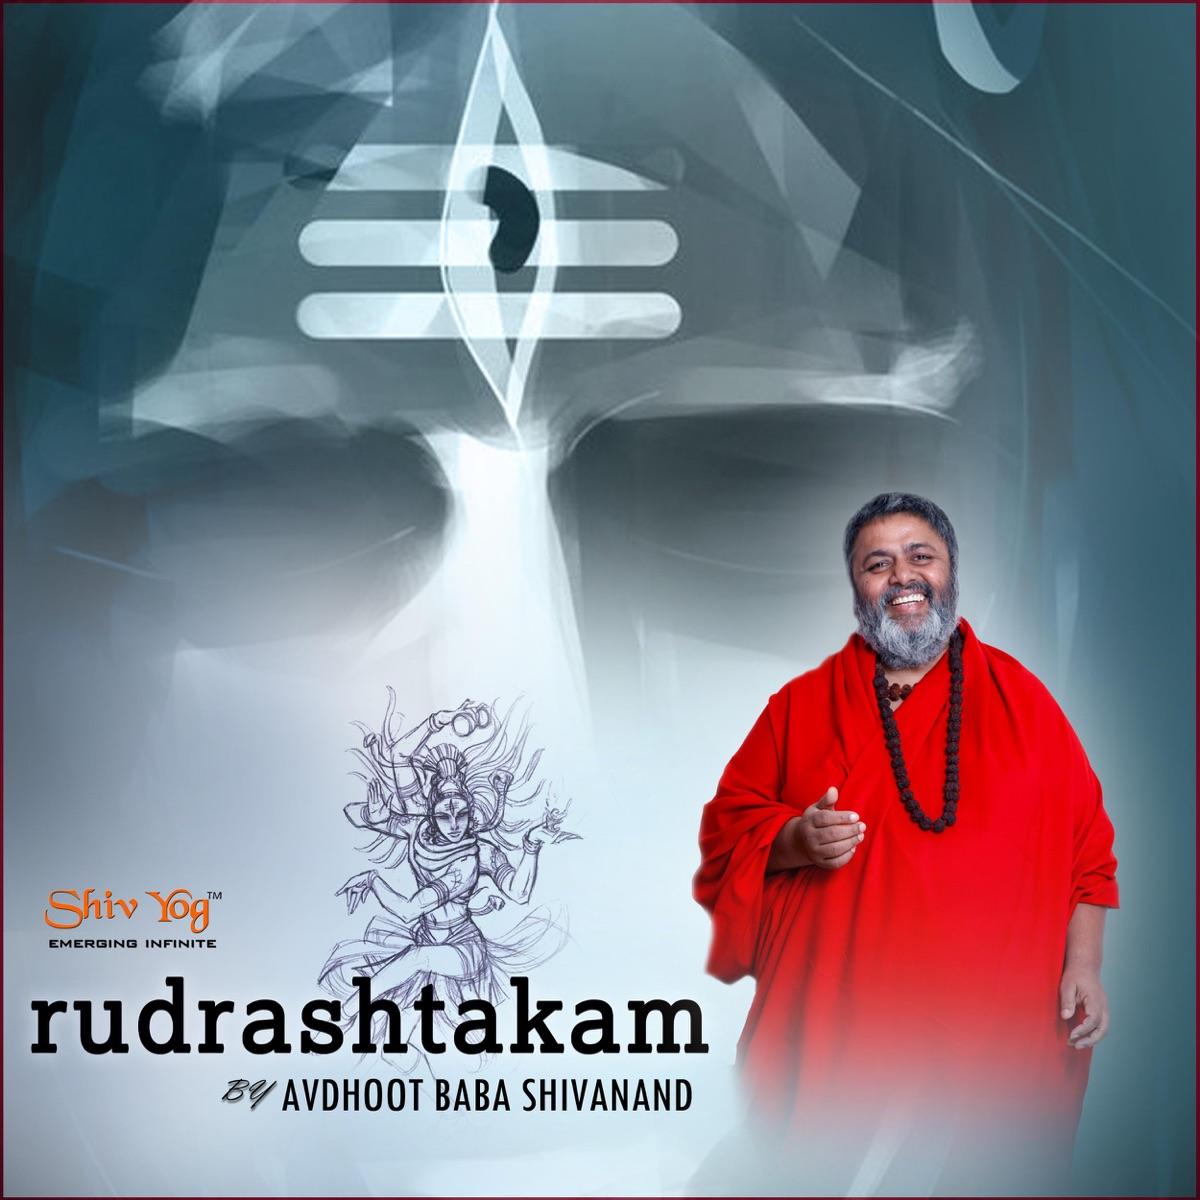 ShivYog Chants Rudrashtakam Album Cover by Avdhoot Baba